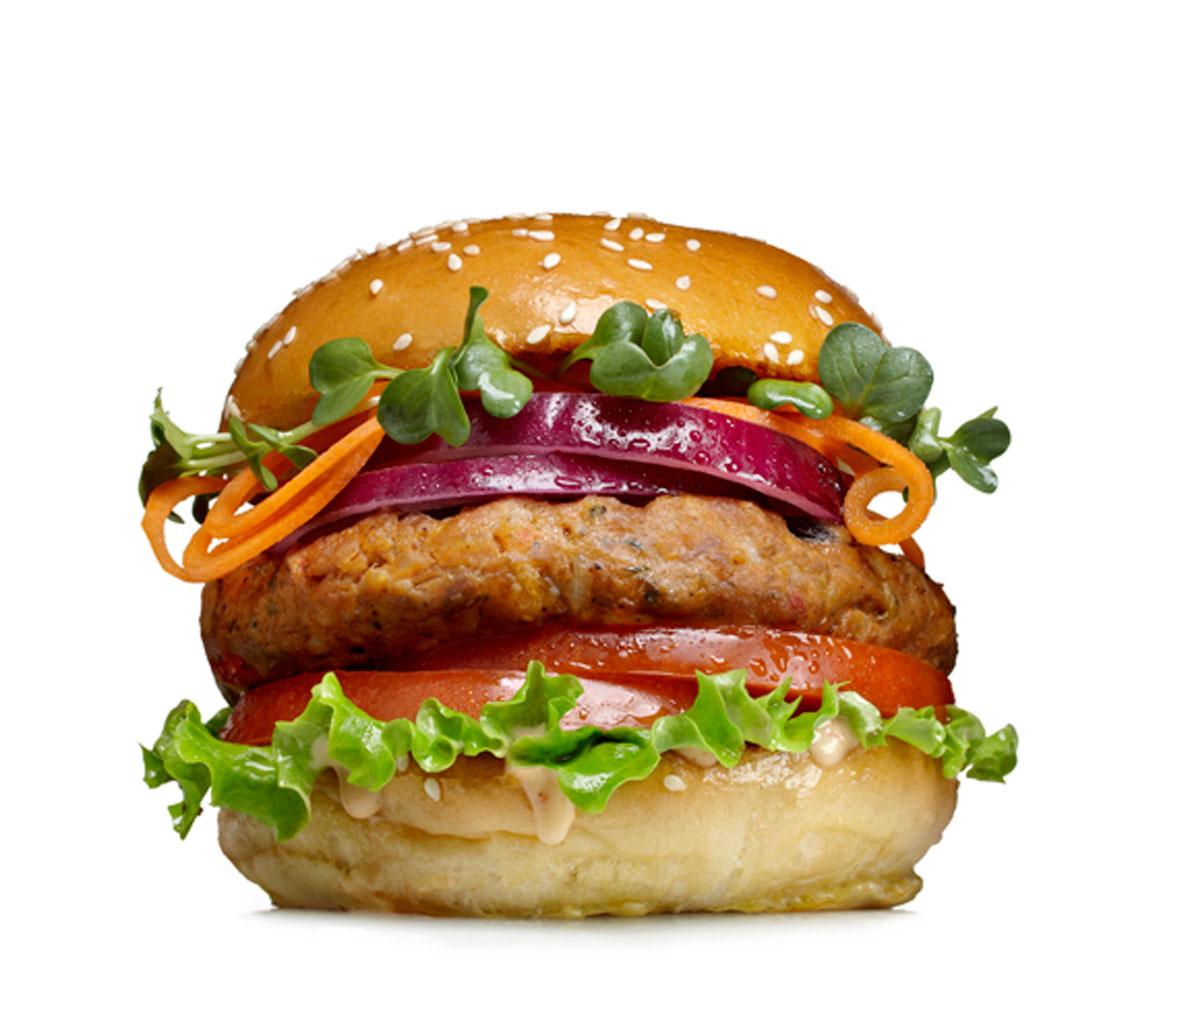 Veggie Burger #3